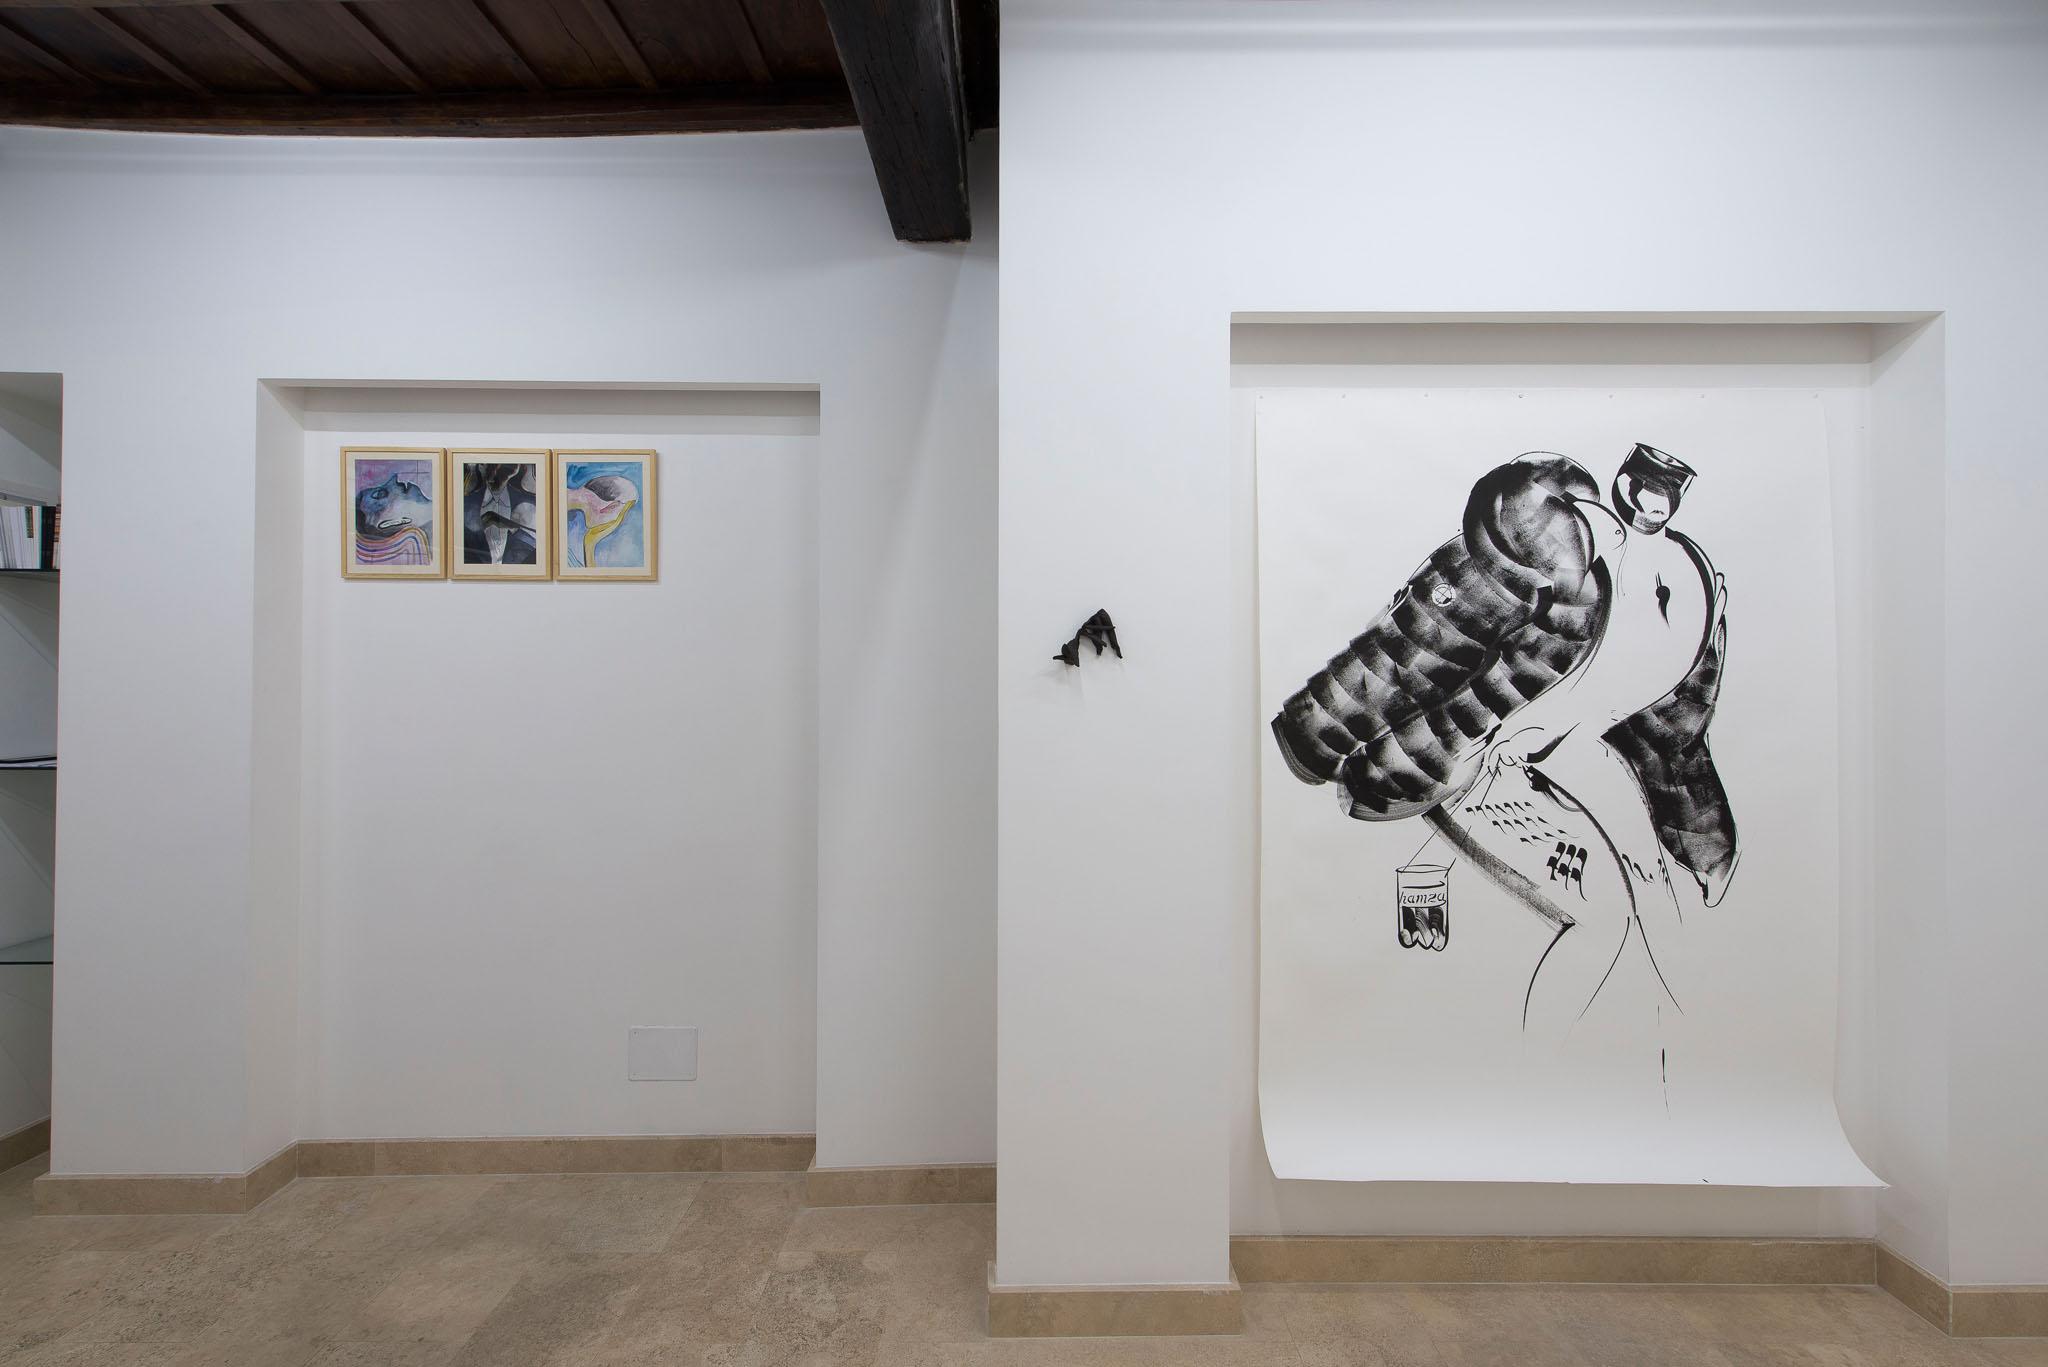 03_Richter Fine Art_In the making_installation view_photo credits Giorgio Benni.jpg